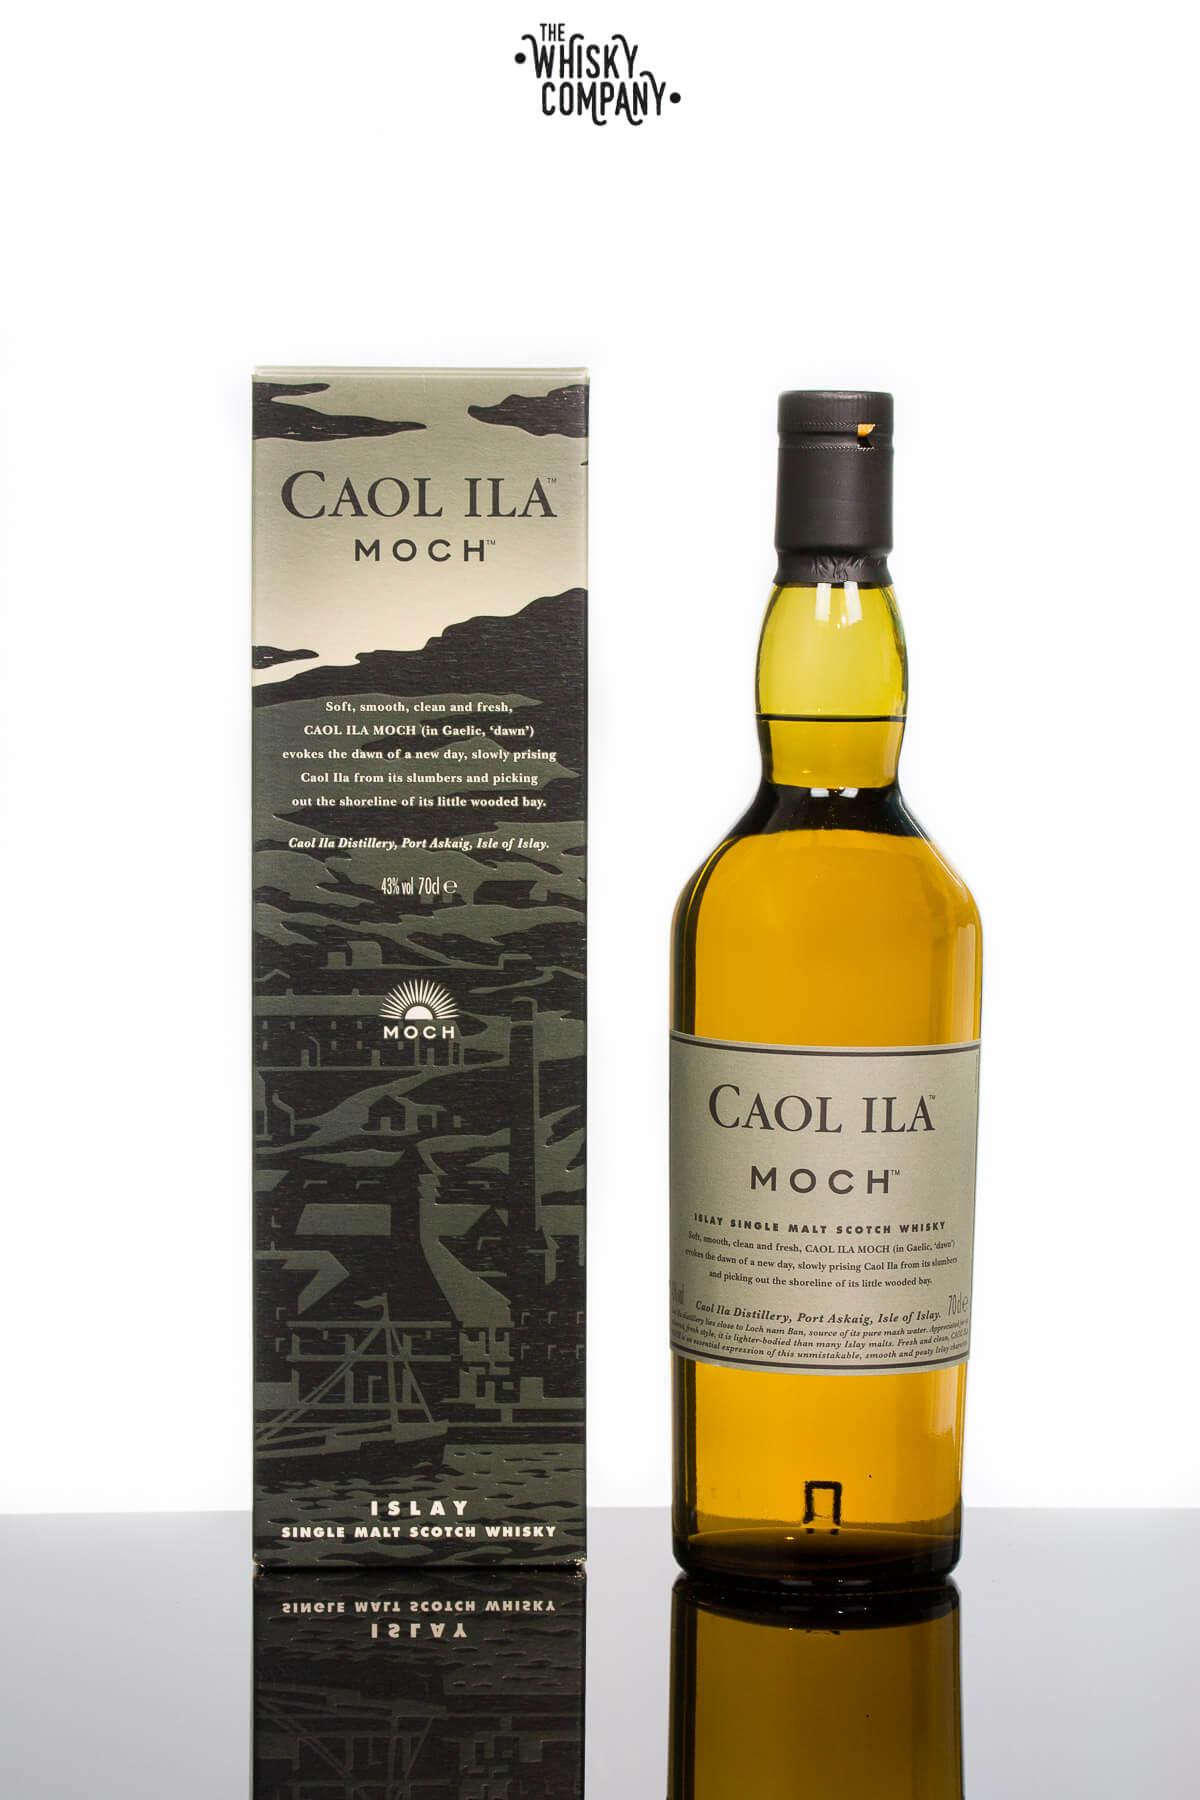 Caol Ila Moch Islay Single Malt Scotch Whisky (700ml)